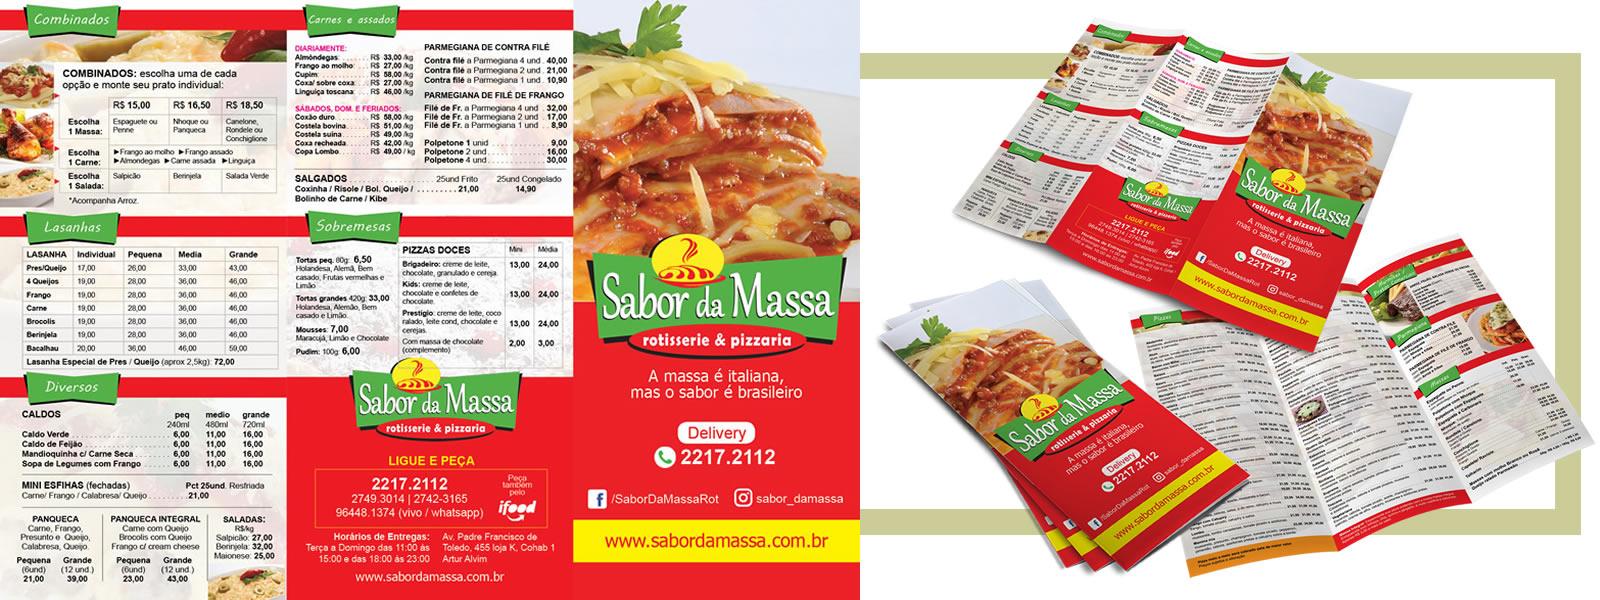 sabor_da_massa_pizzaria__osvaldo_almeida_banner